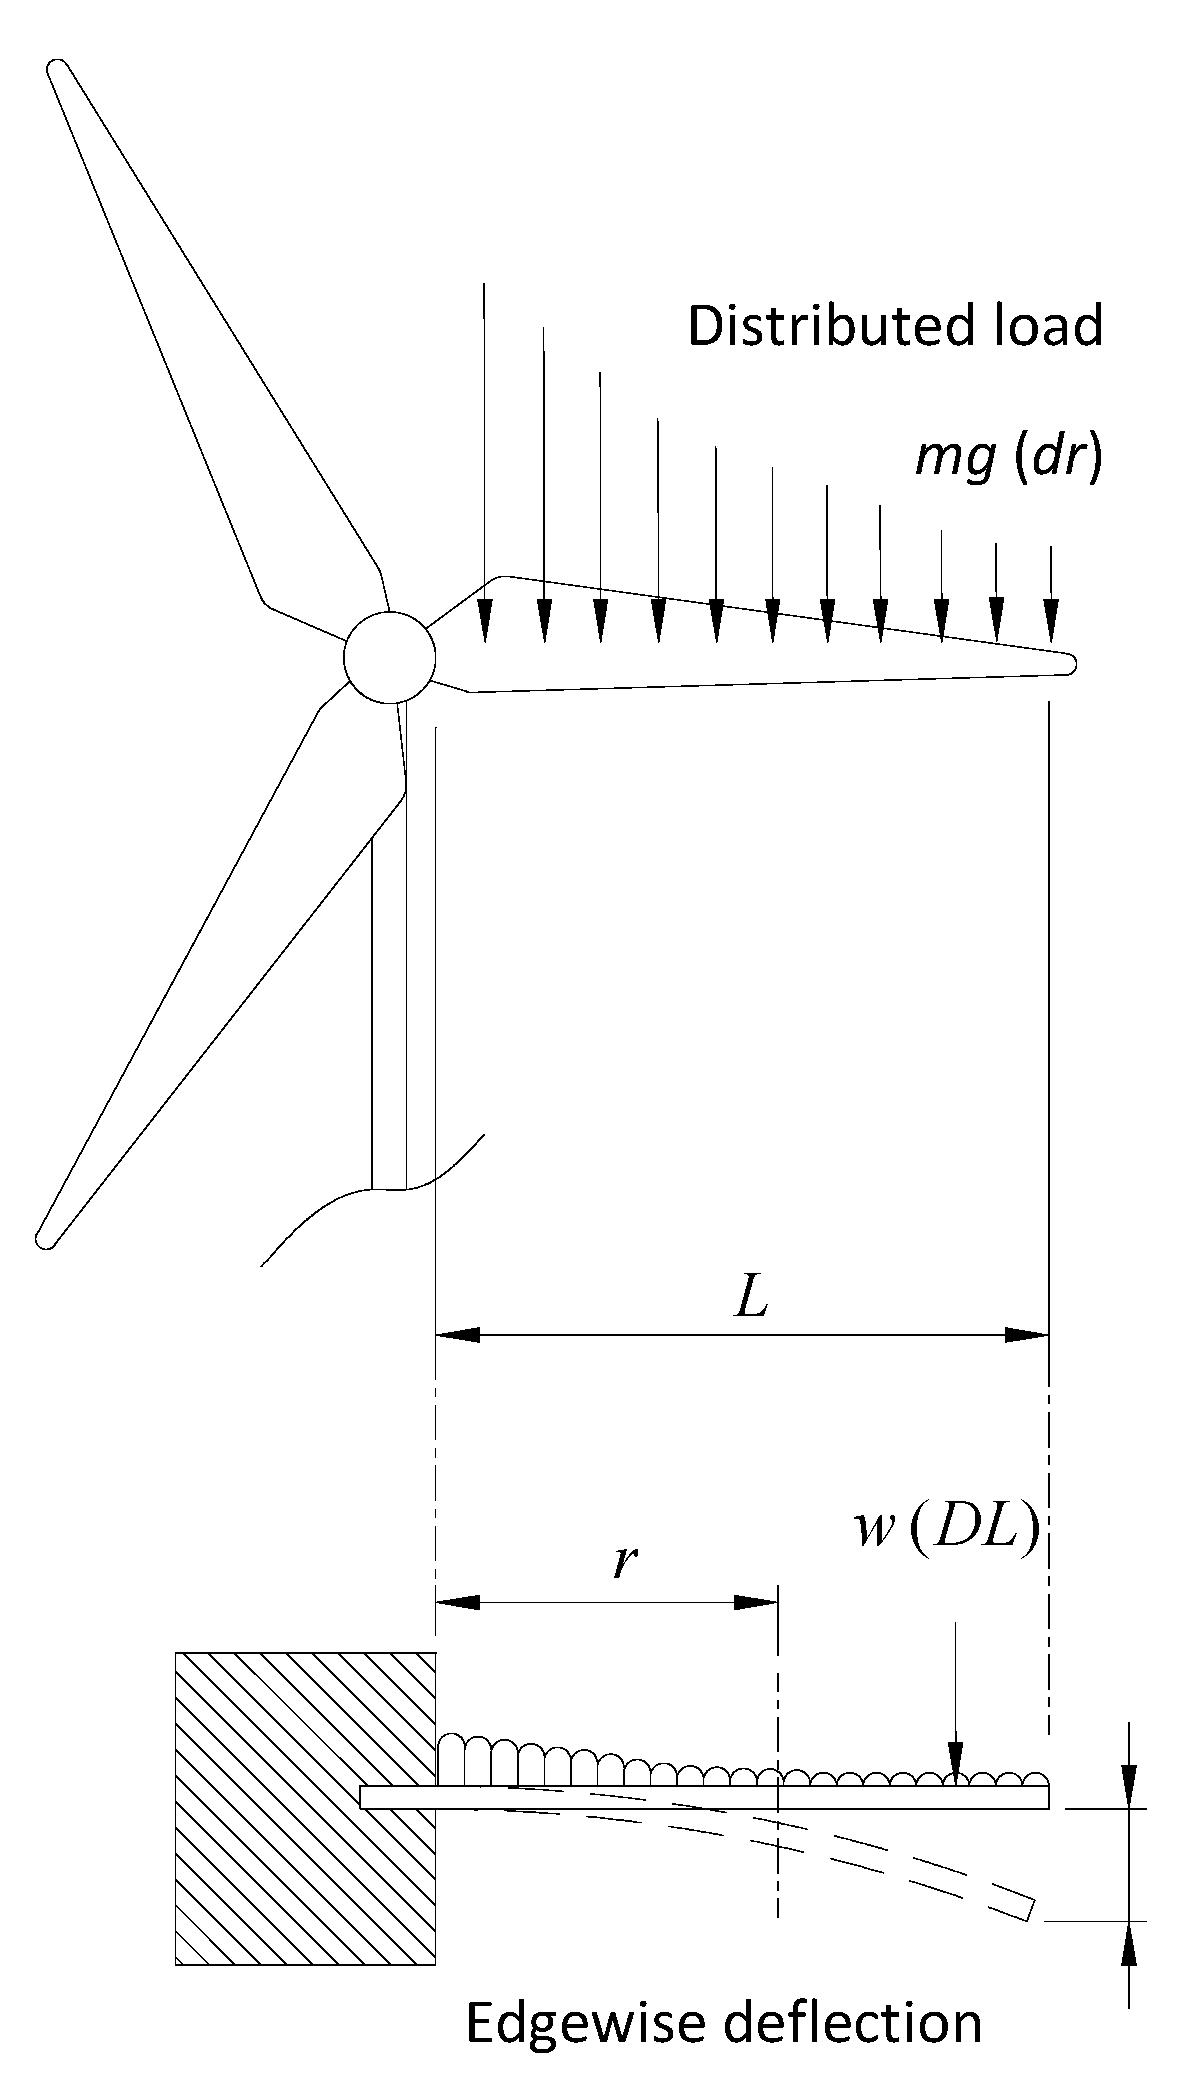 Energies Free Full Text Wind Turbine Blade Design Beam Deflection Diagram No